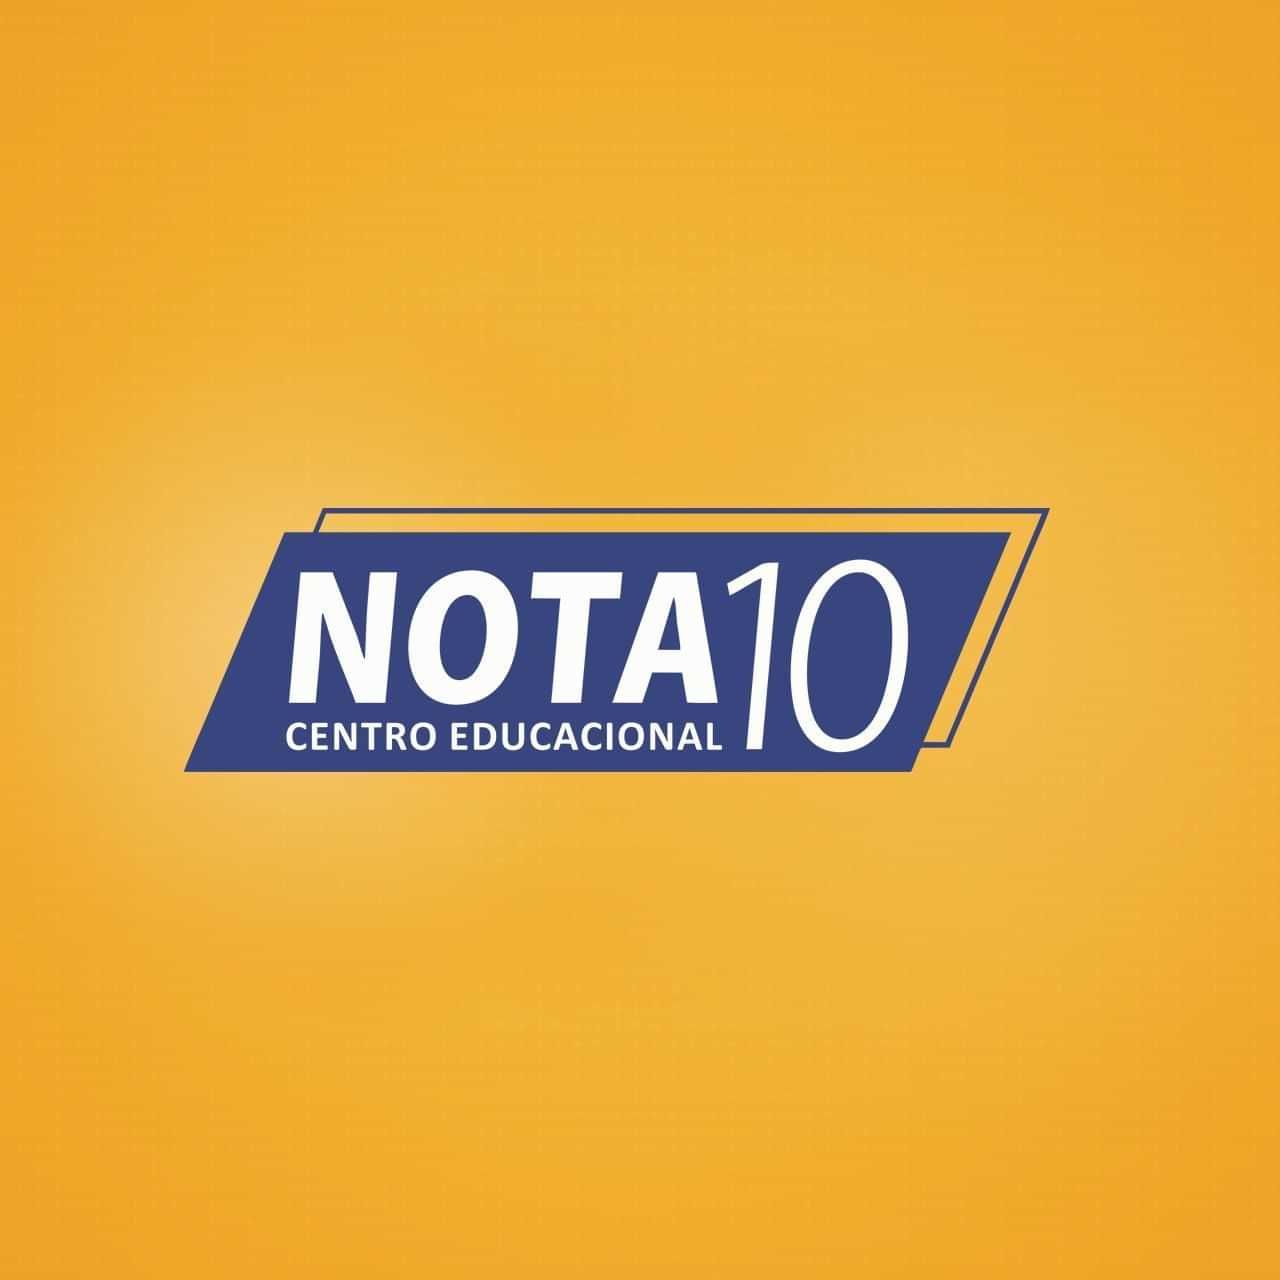 Centro Educacional Nota 10